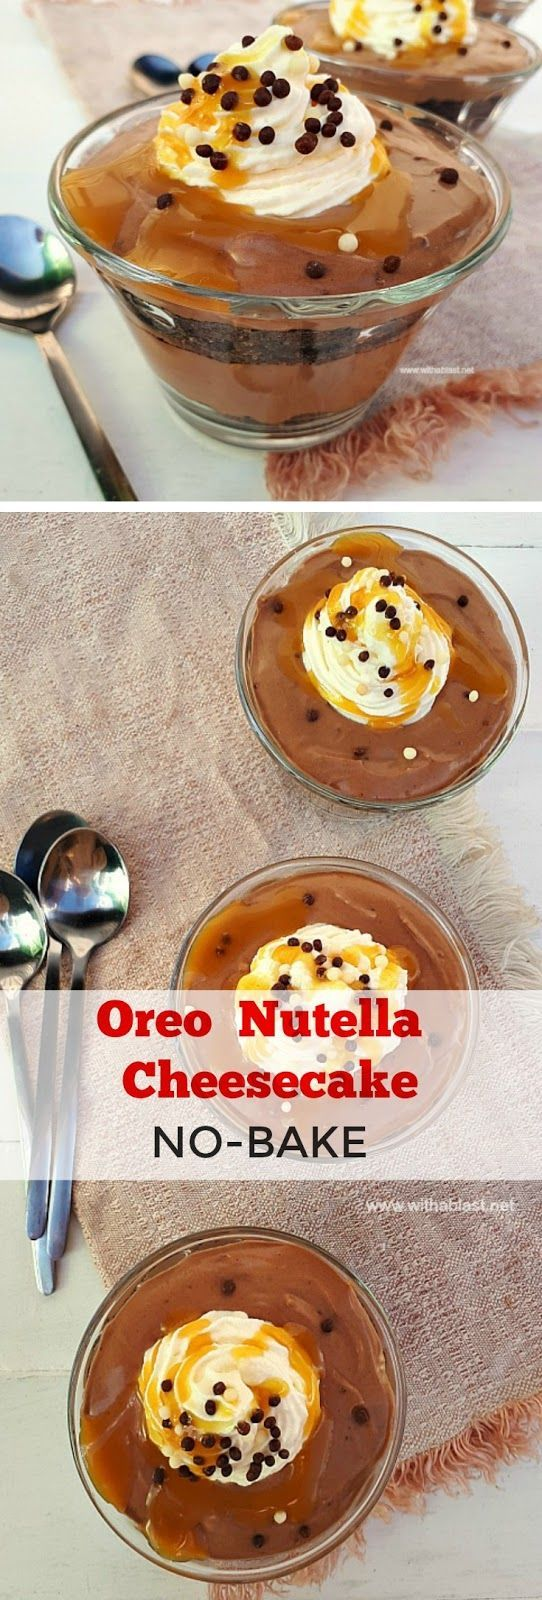 An easy, no-bake Oreo Nutella Cheesecake for a last minute dessert #NoBake #Cheesecake #EasyDessert